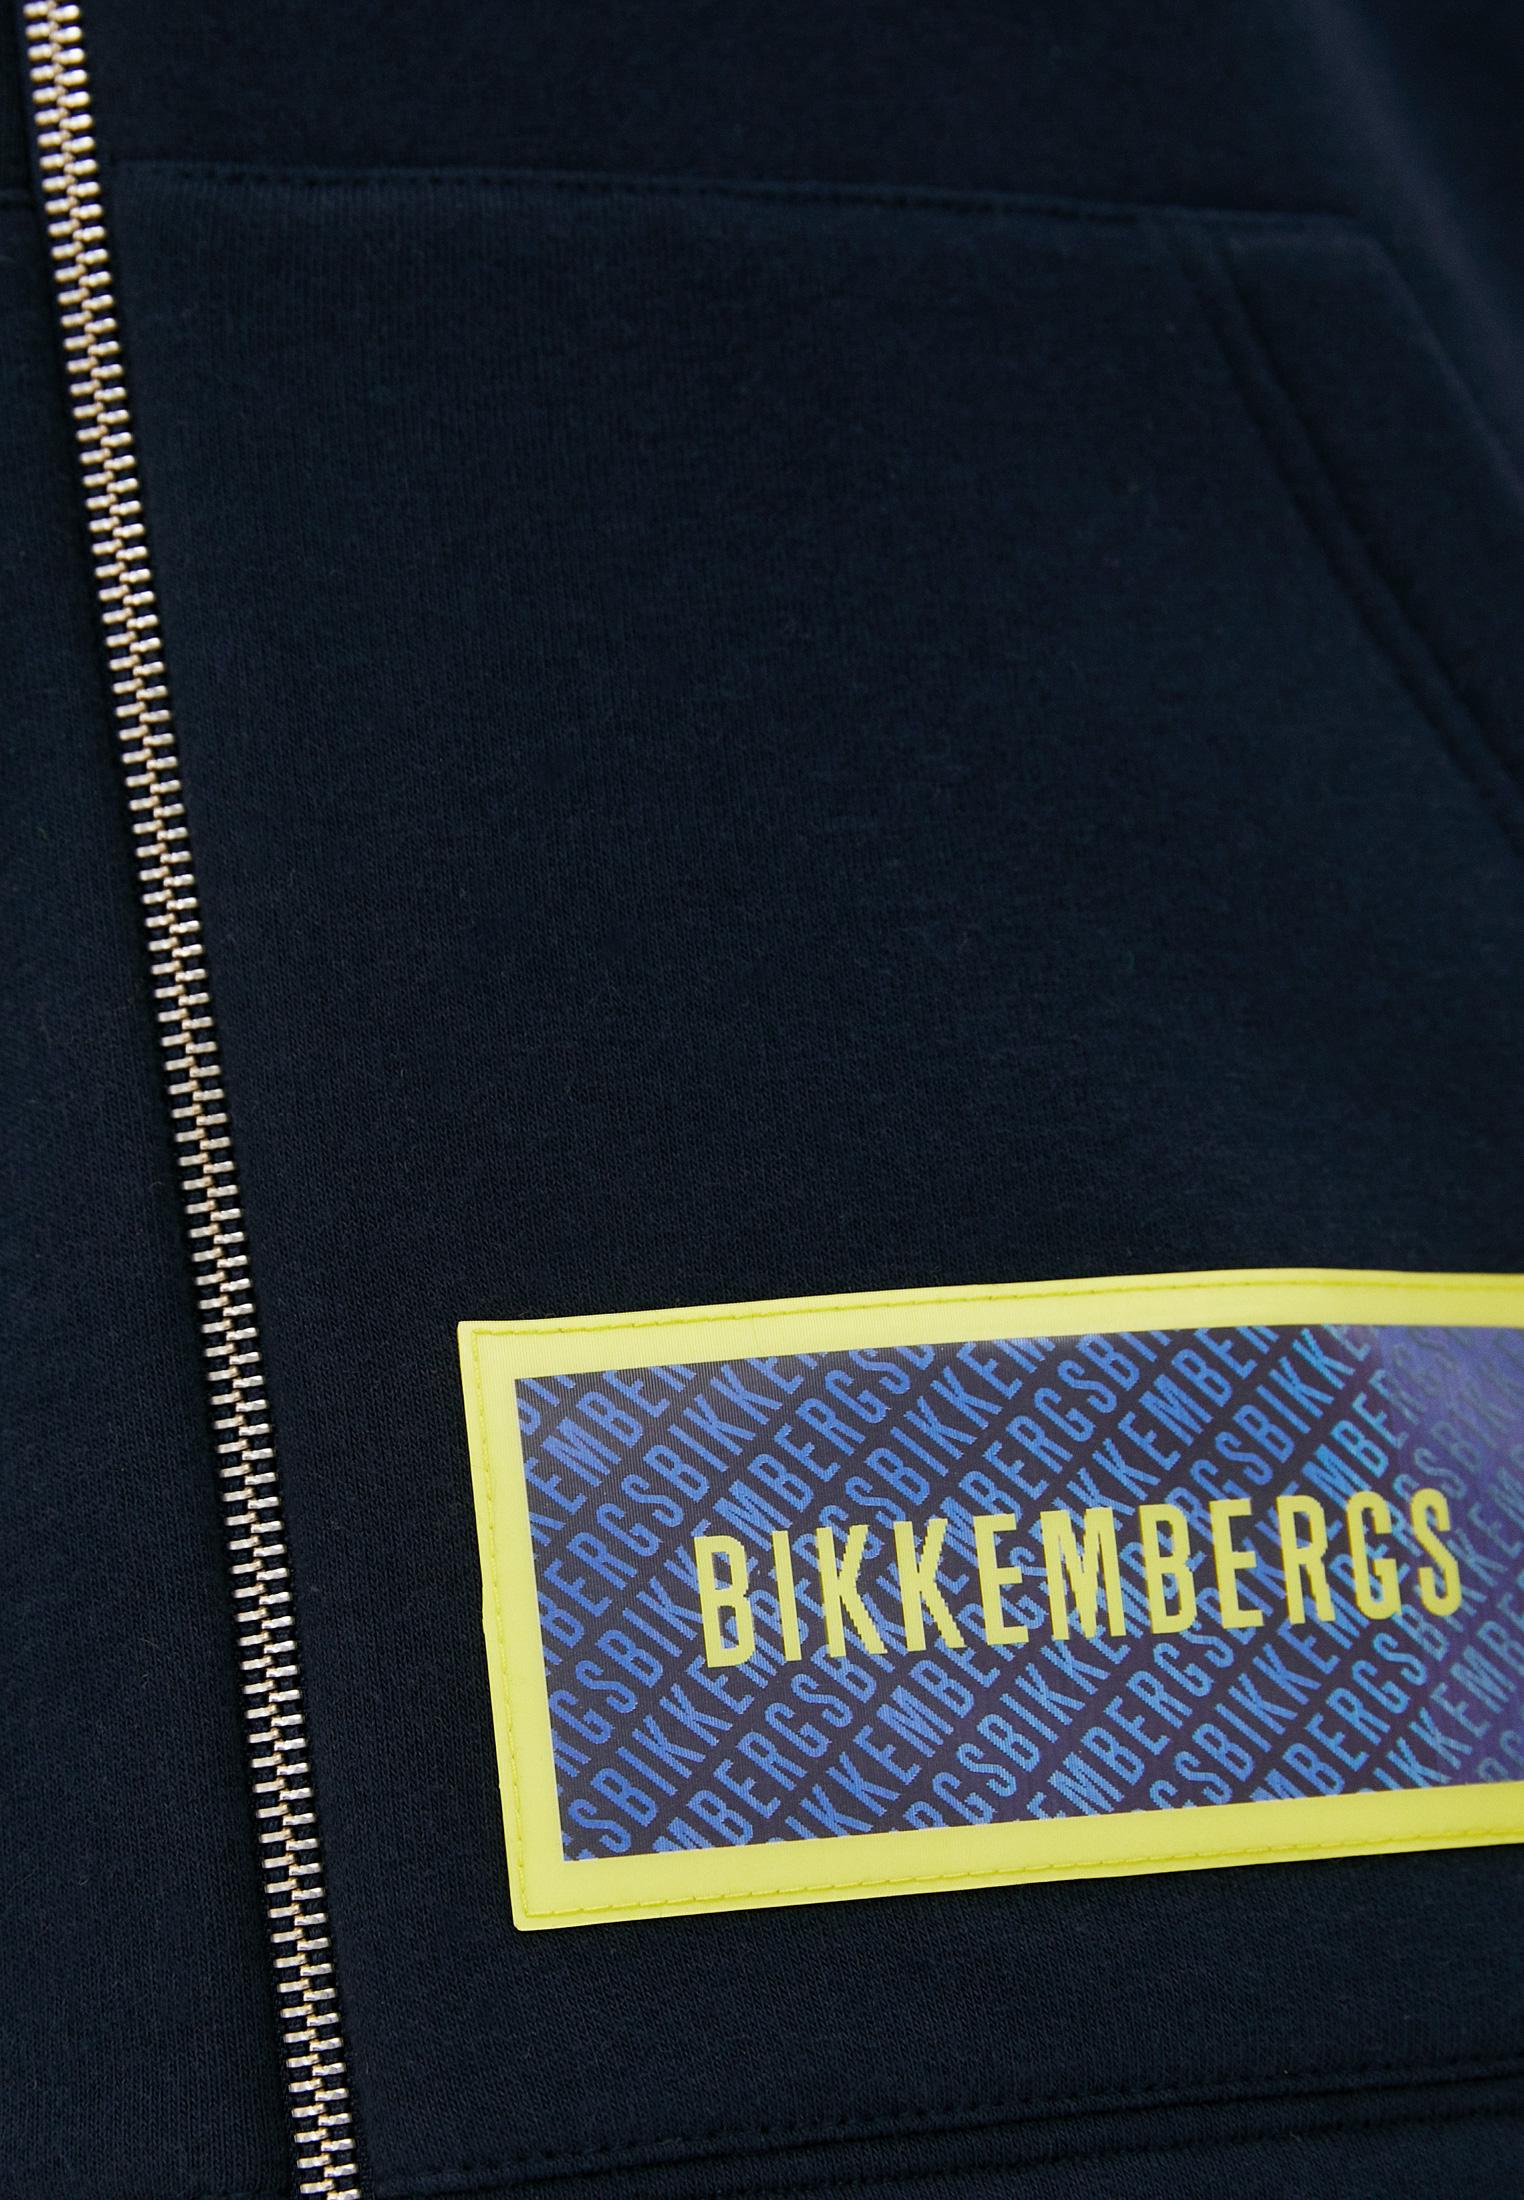 Кардиган Bikkembergs (Биккембергс) C S J29 91 X 0683: изображение 5